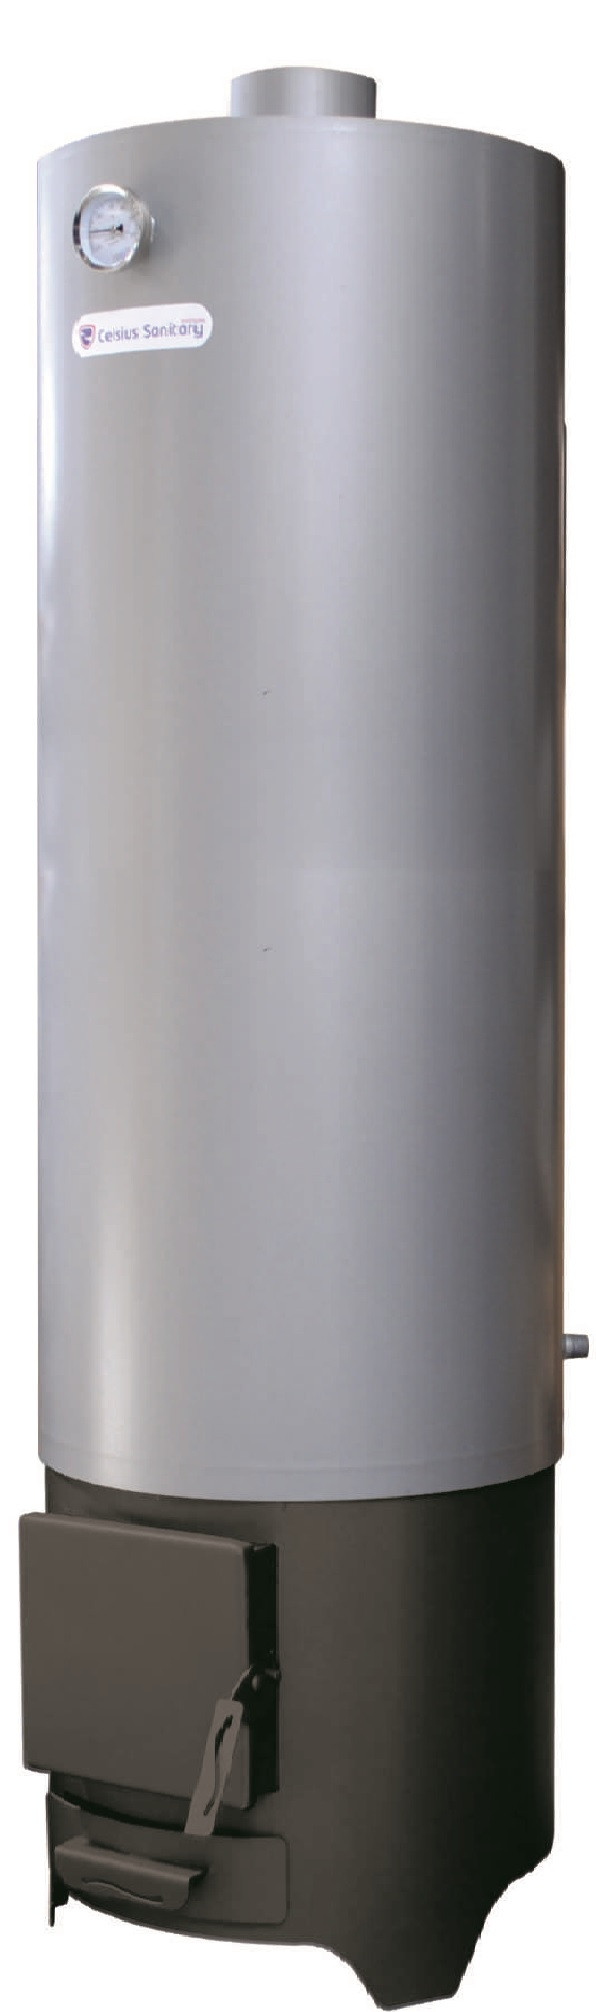 Ansamblu boiler pe lemn cu focar rotund FM tabla vopsita 120 litri